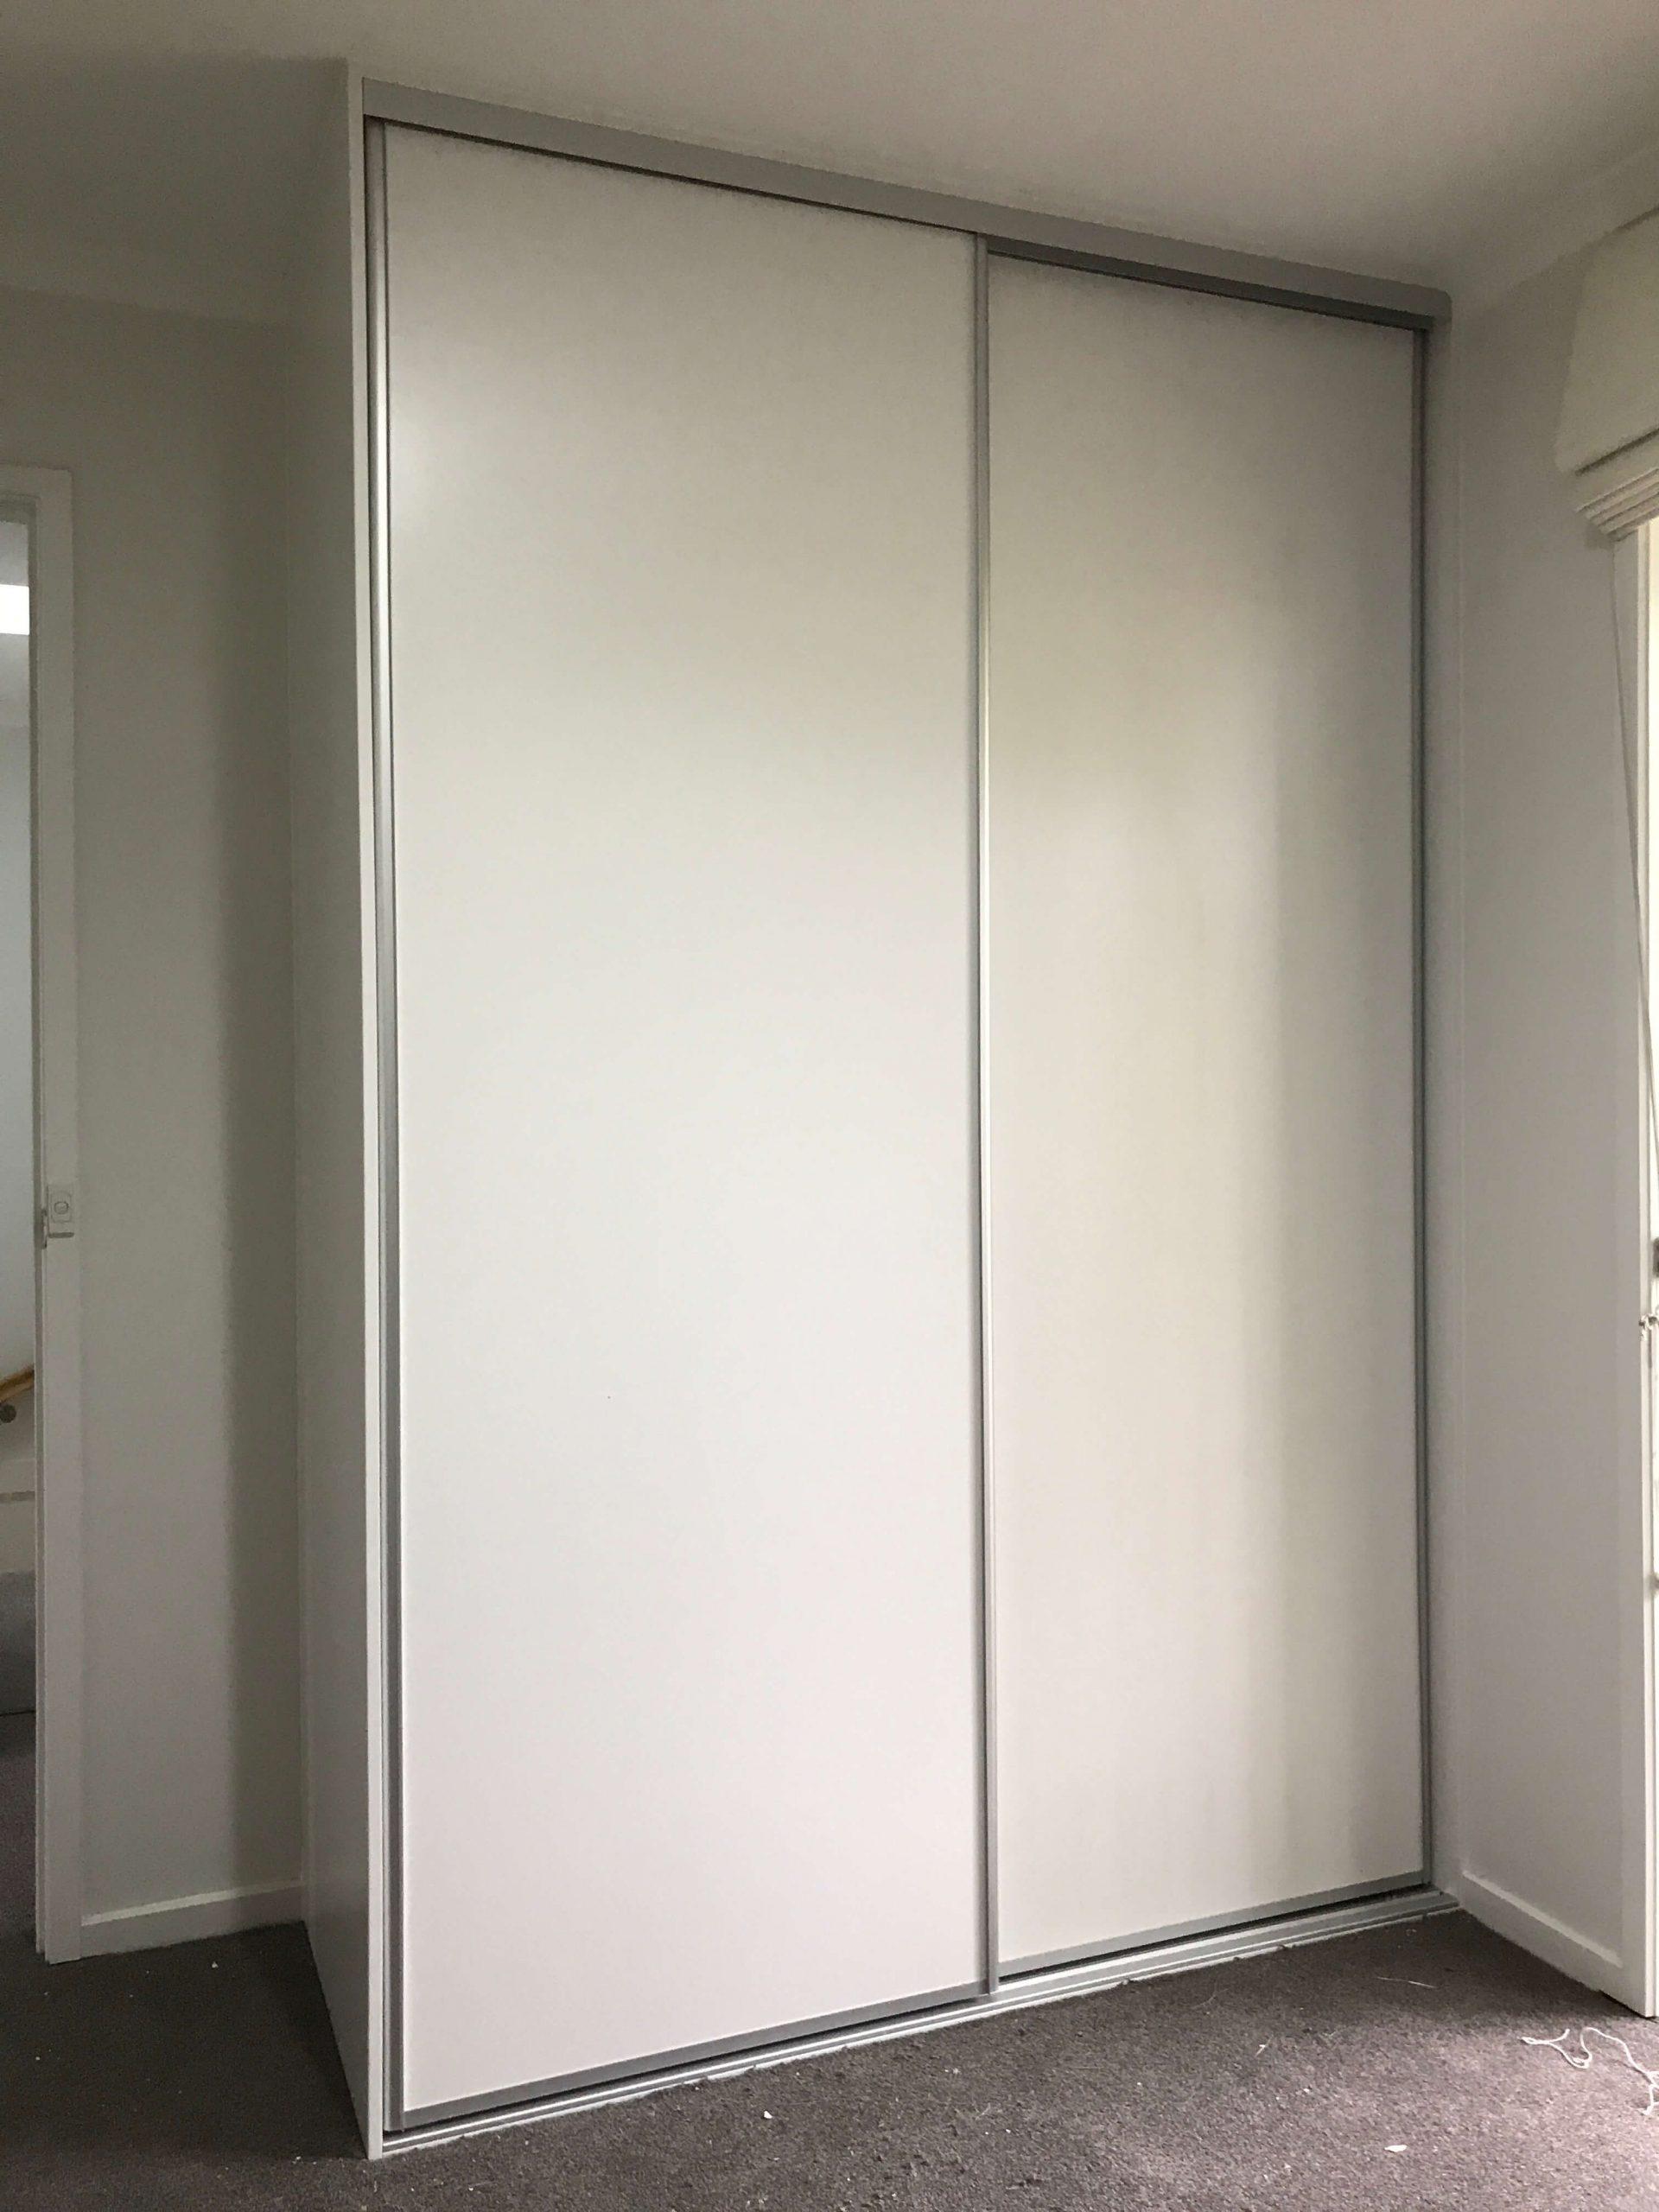 9mm Classic White Matt sliding wardrobe doors